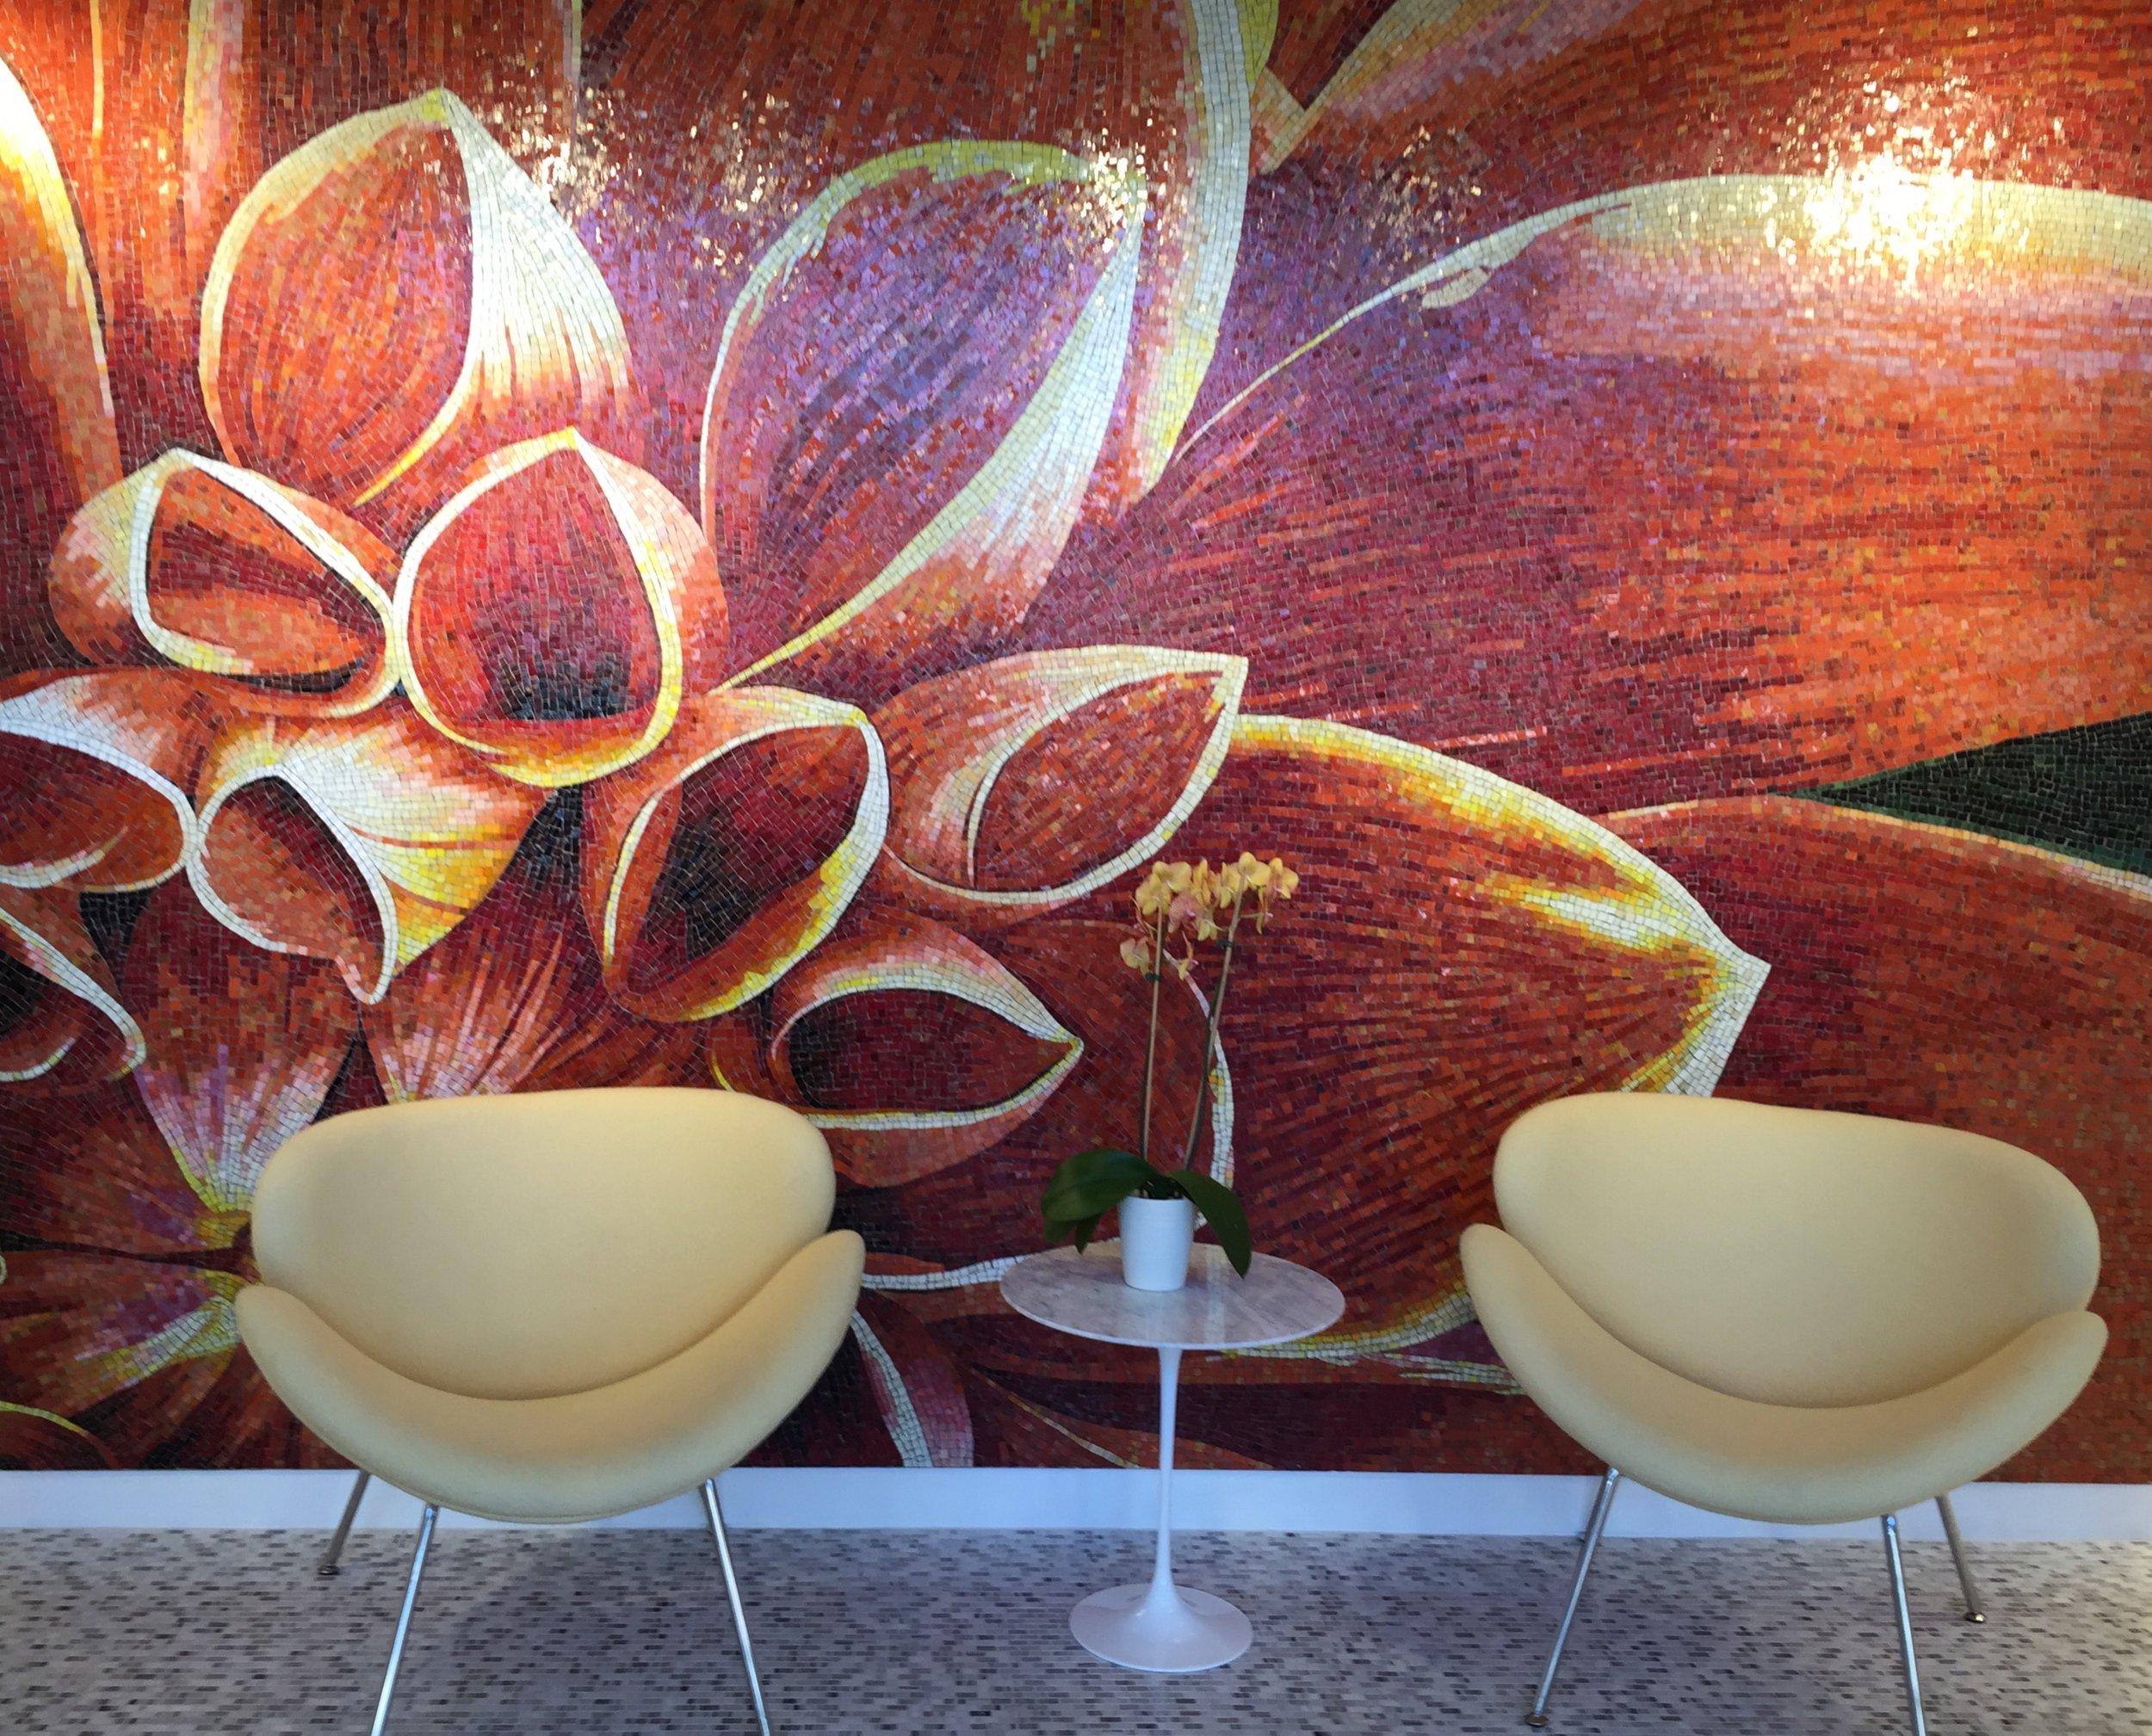 The dahlia mosaic tile mural at Daltile, San Francisco